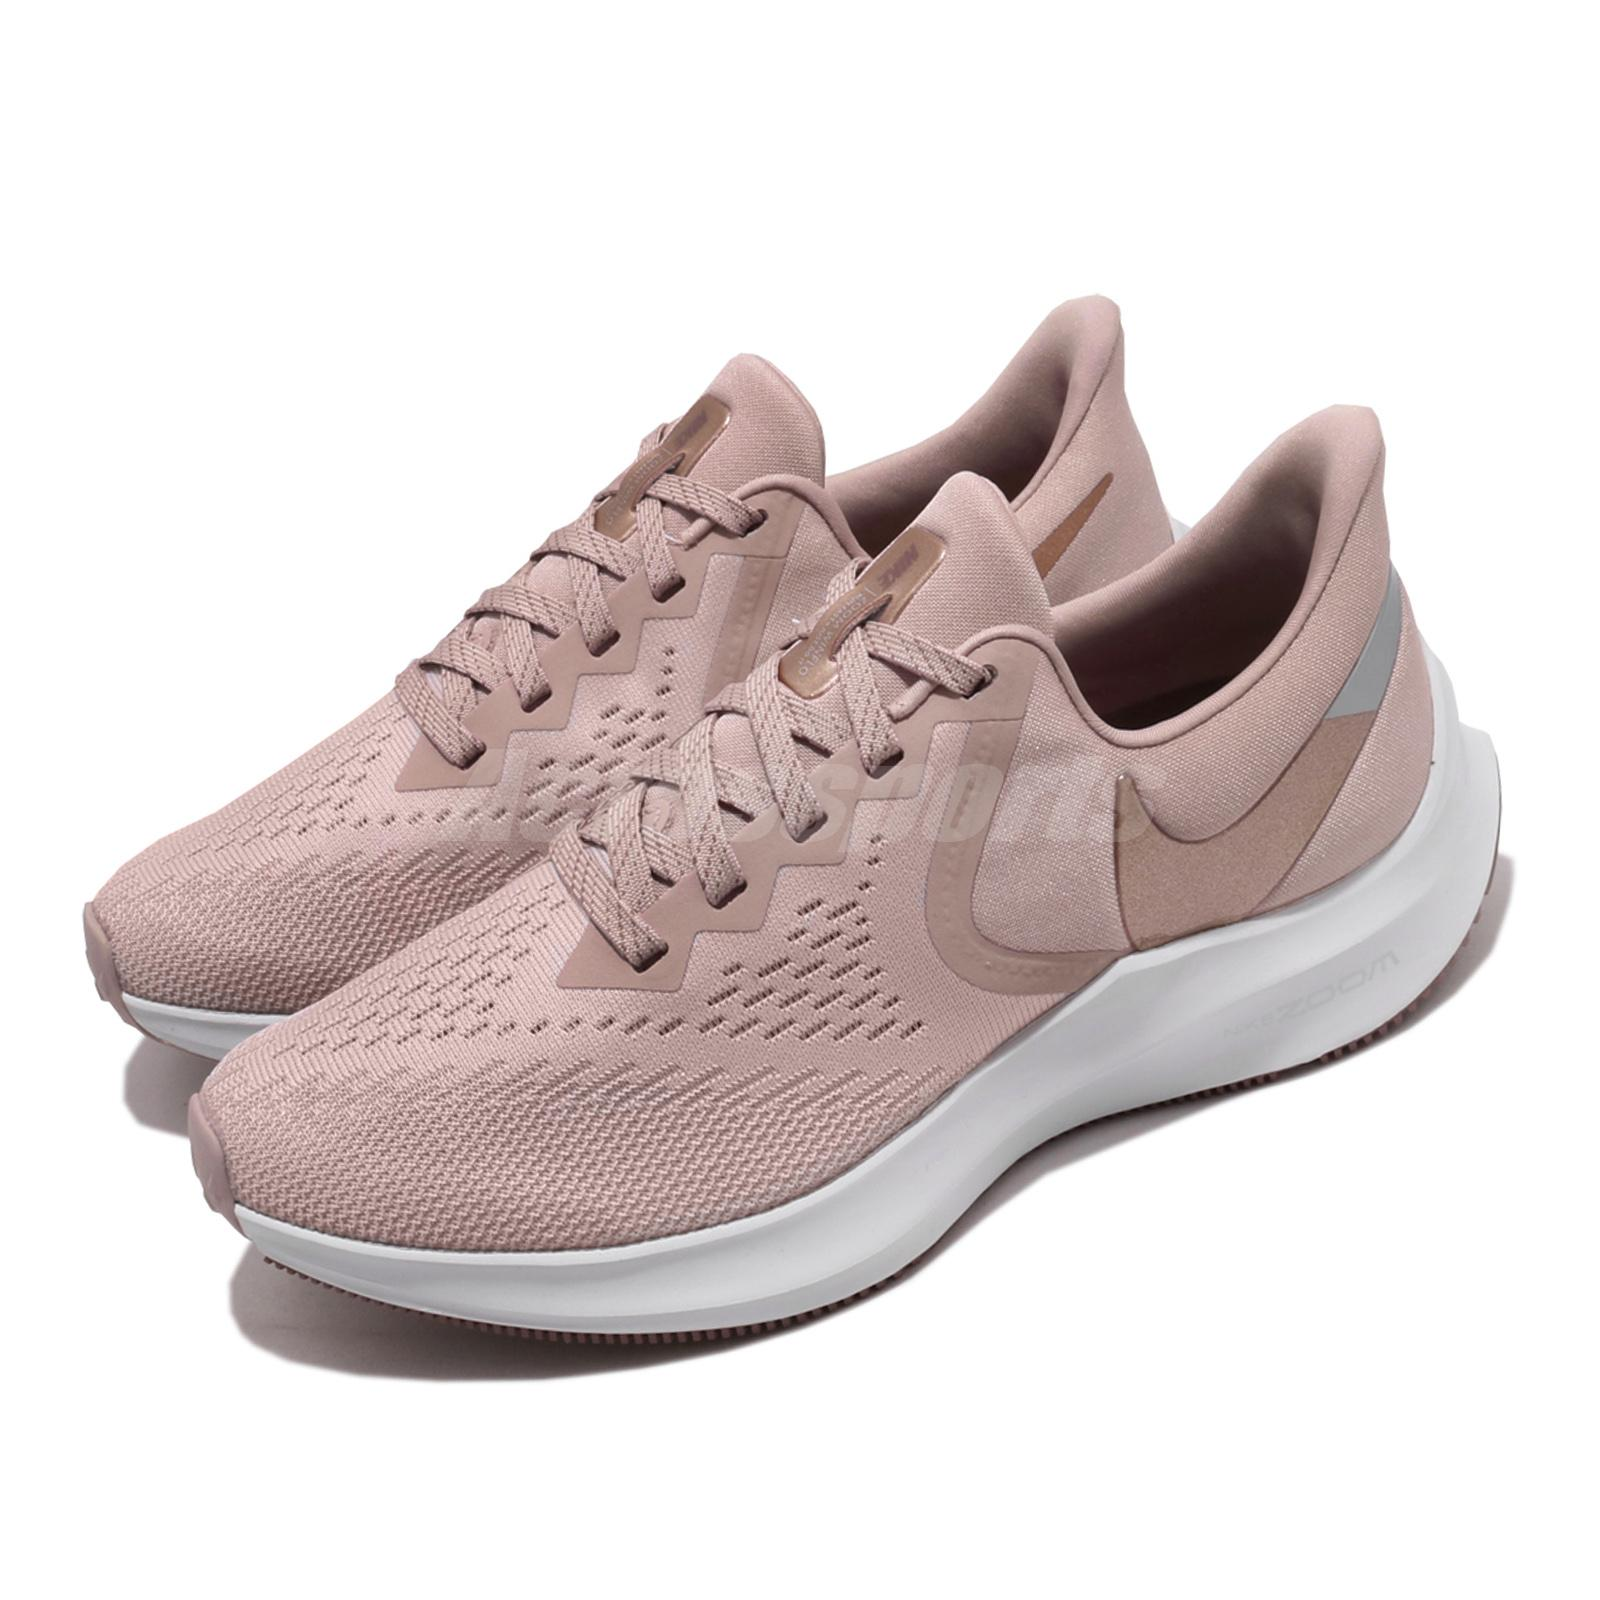 Detalles acerca de Nike Wmns Zoom Winflo 6 Rosa Bronce Mujeres Tenis para  Correr AQ8228-200- mostrar título original